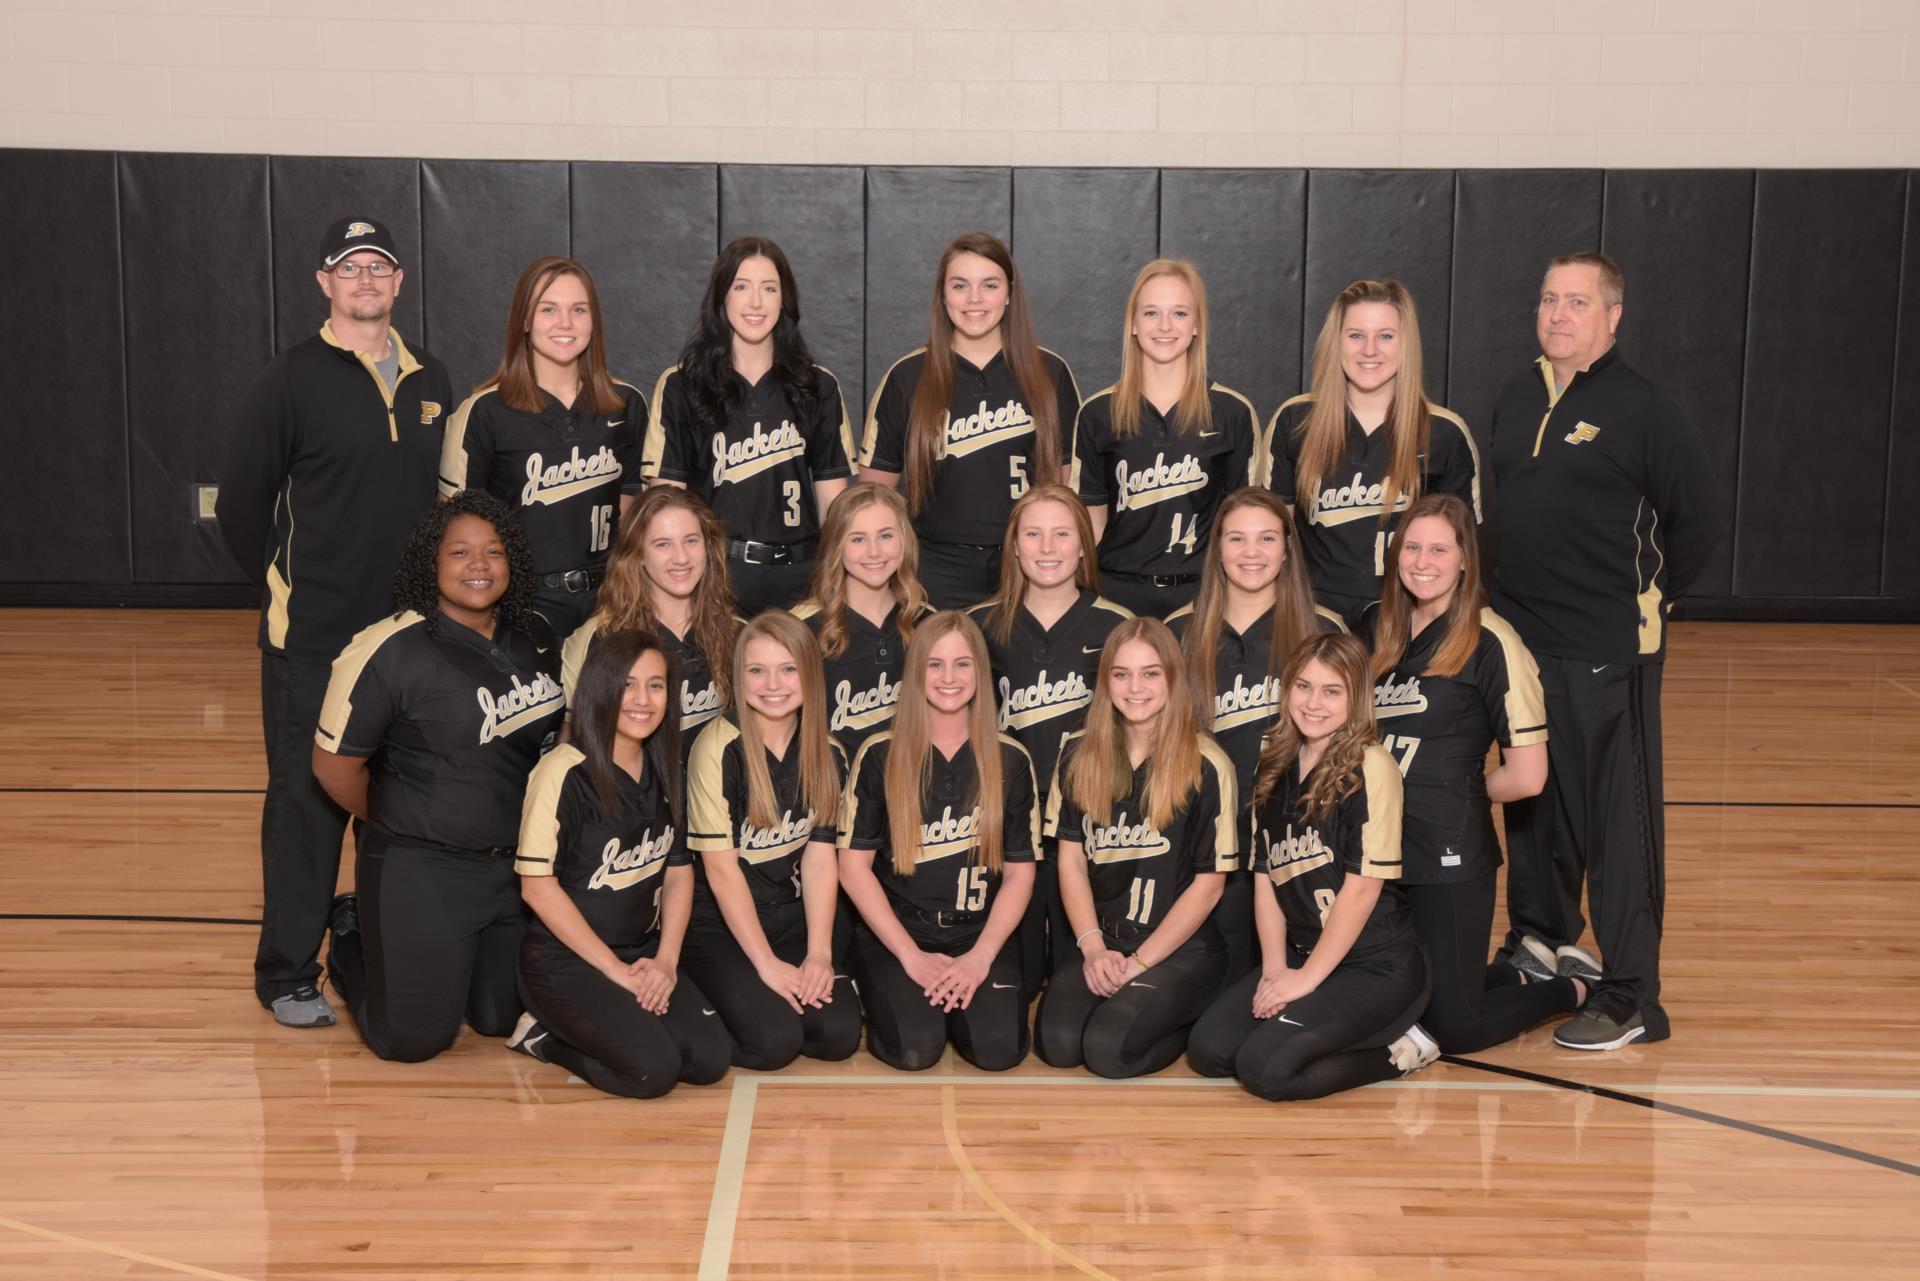 PHS Softball Team Photo